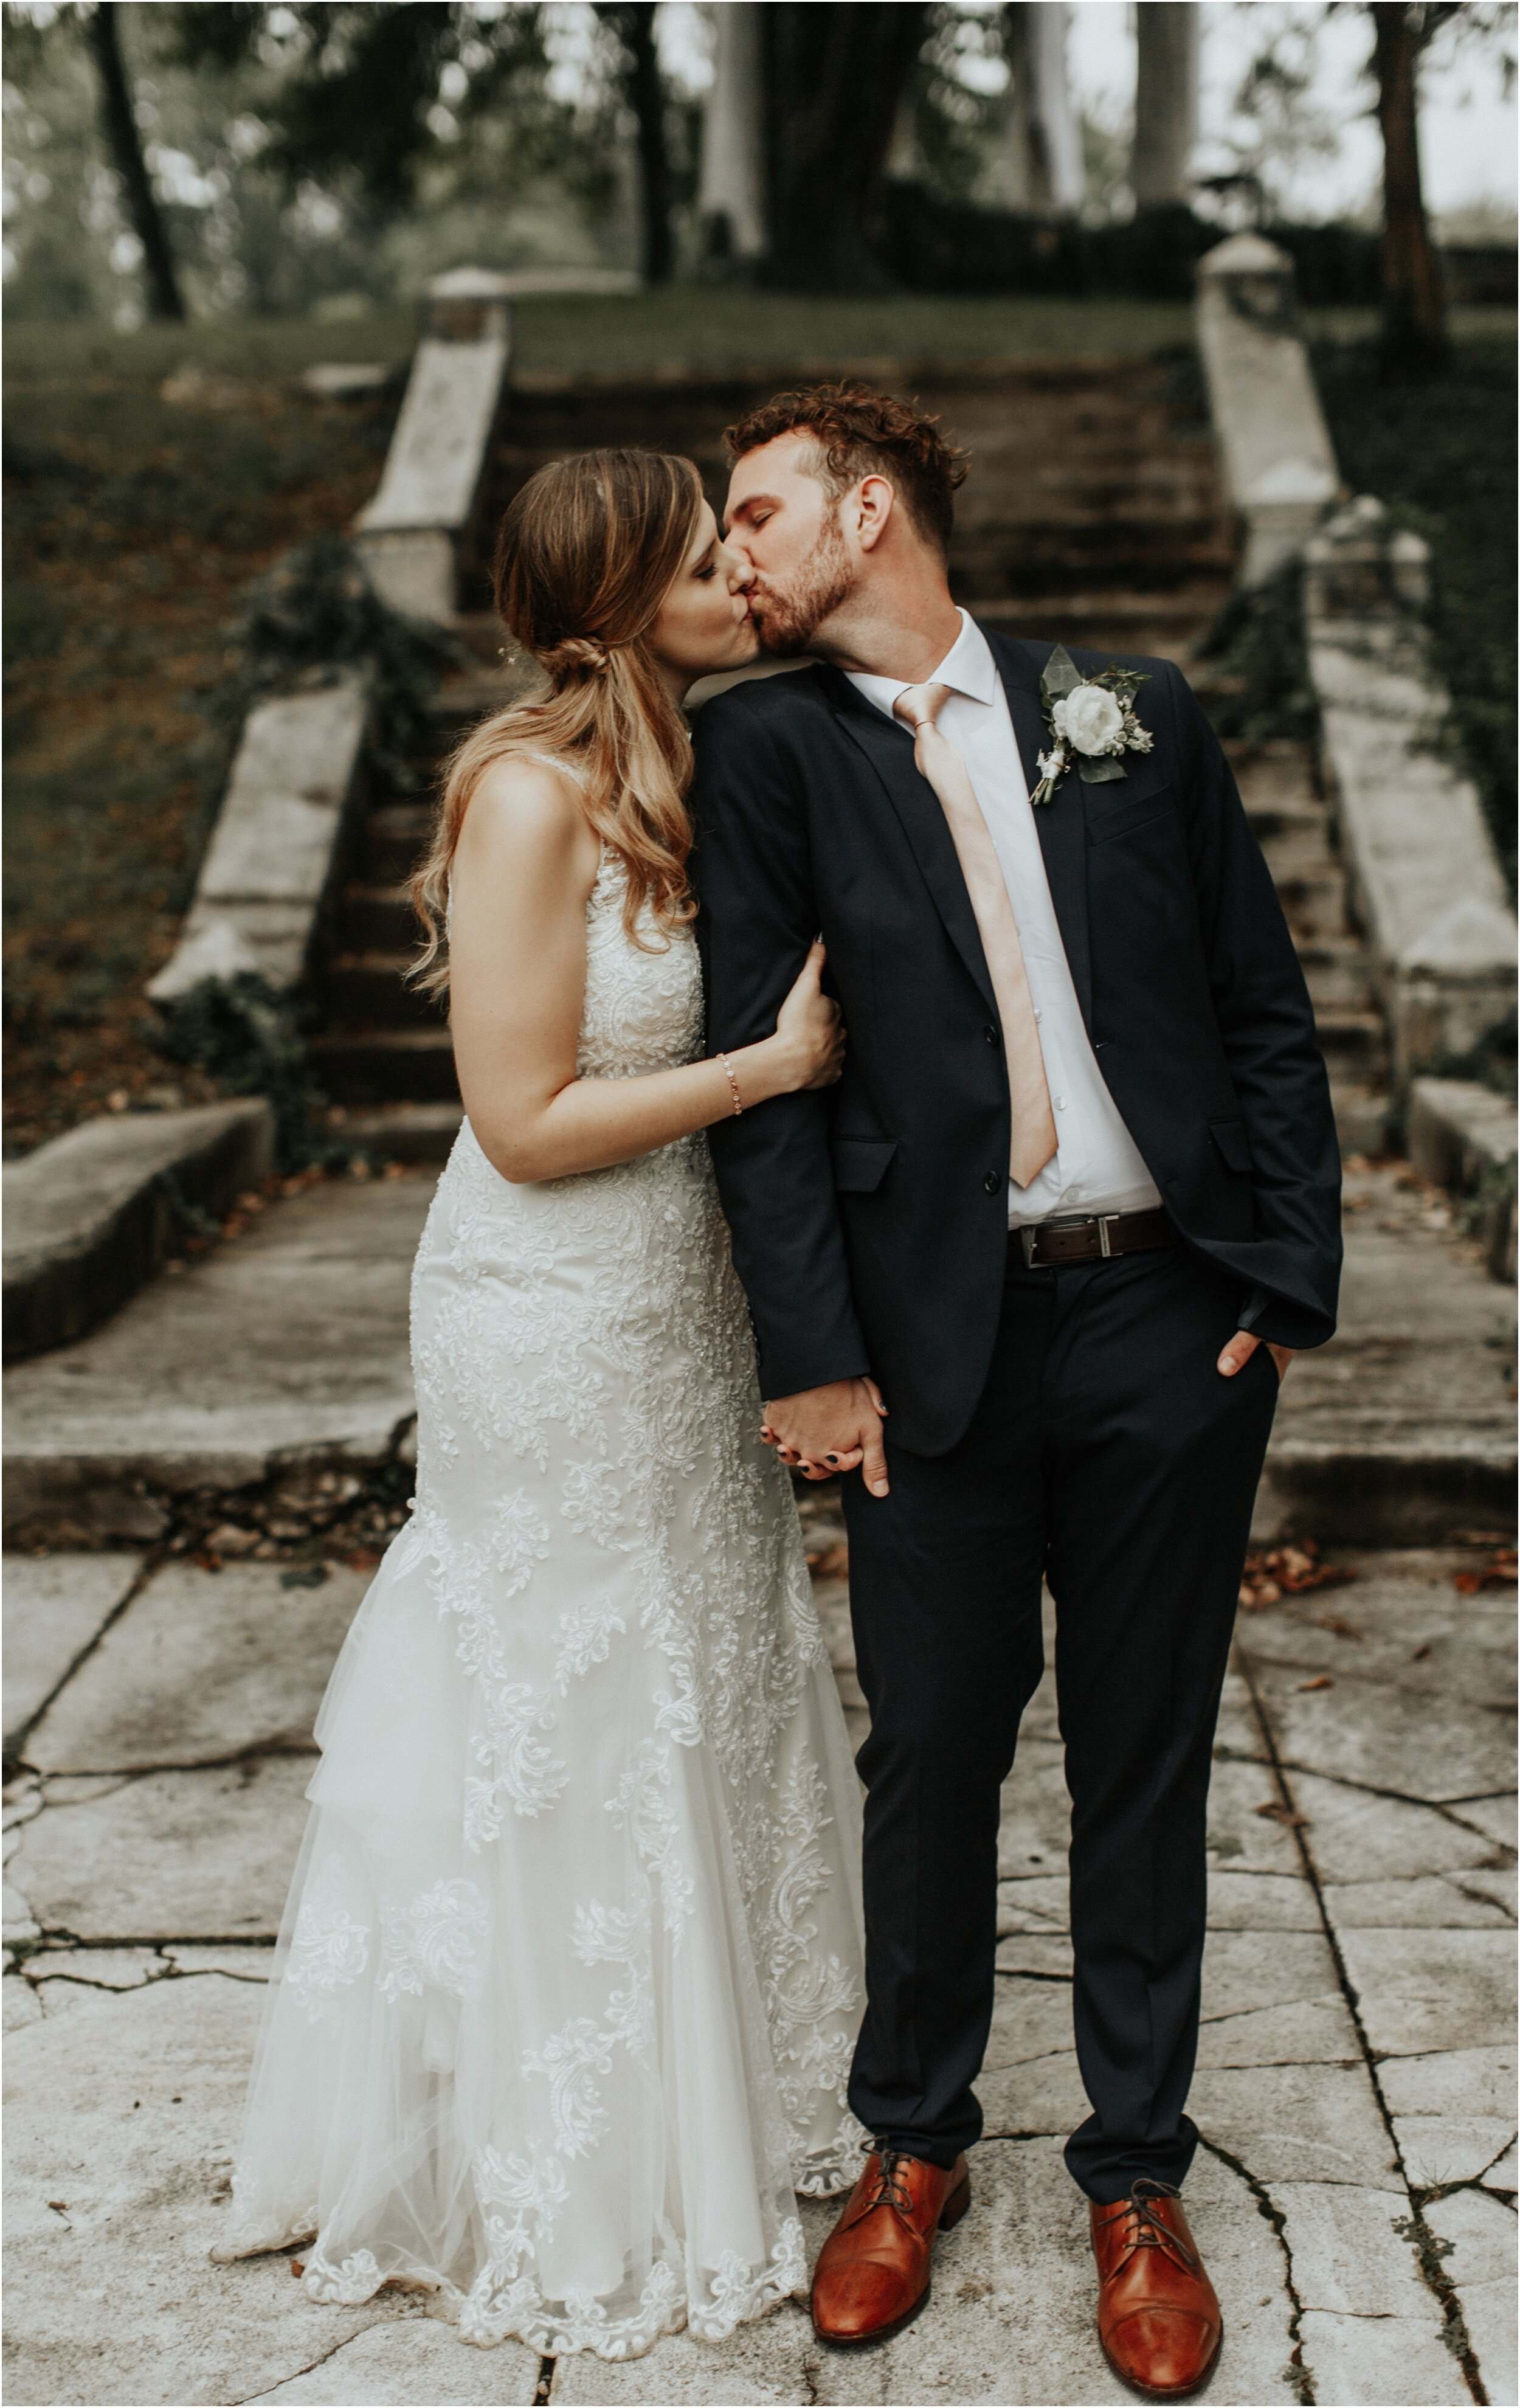 steph-and-jordan-cox-our-wedding-historic-shady-lane-compass-wedding-collective-hazel-lining-photography-destination-elopement-wedding-engagement-photography_0071.jpg